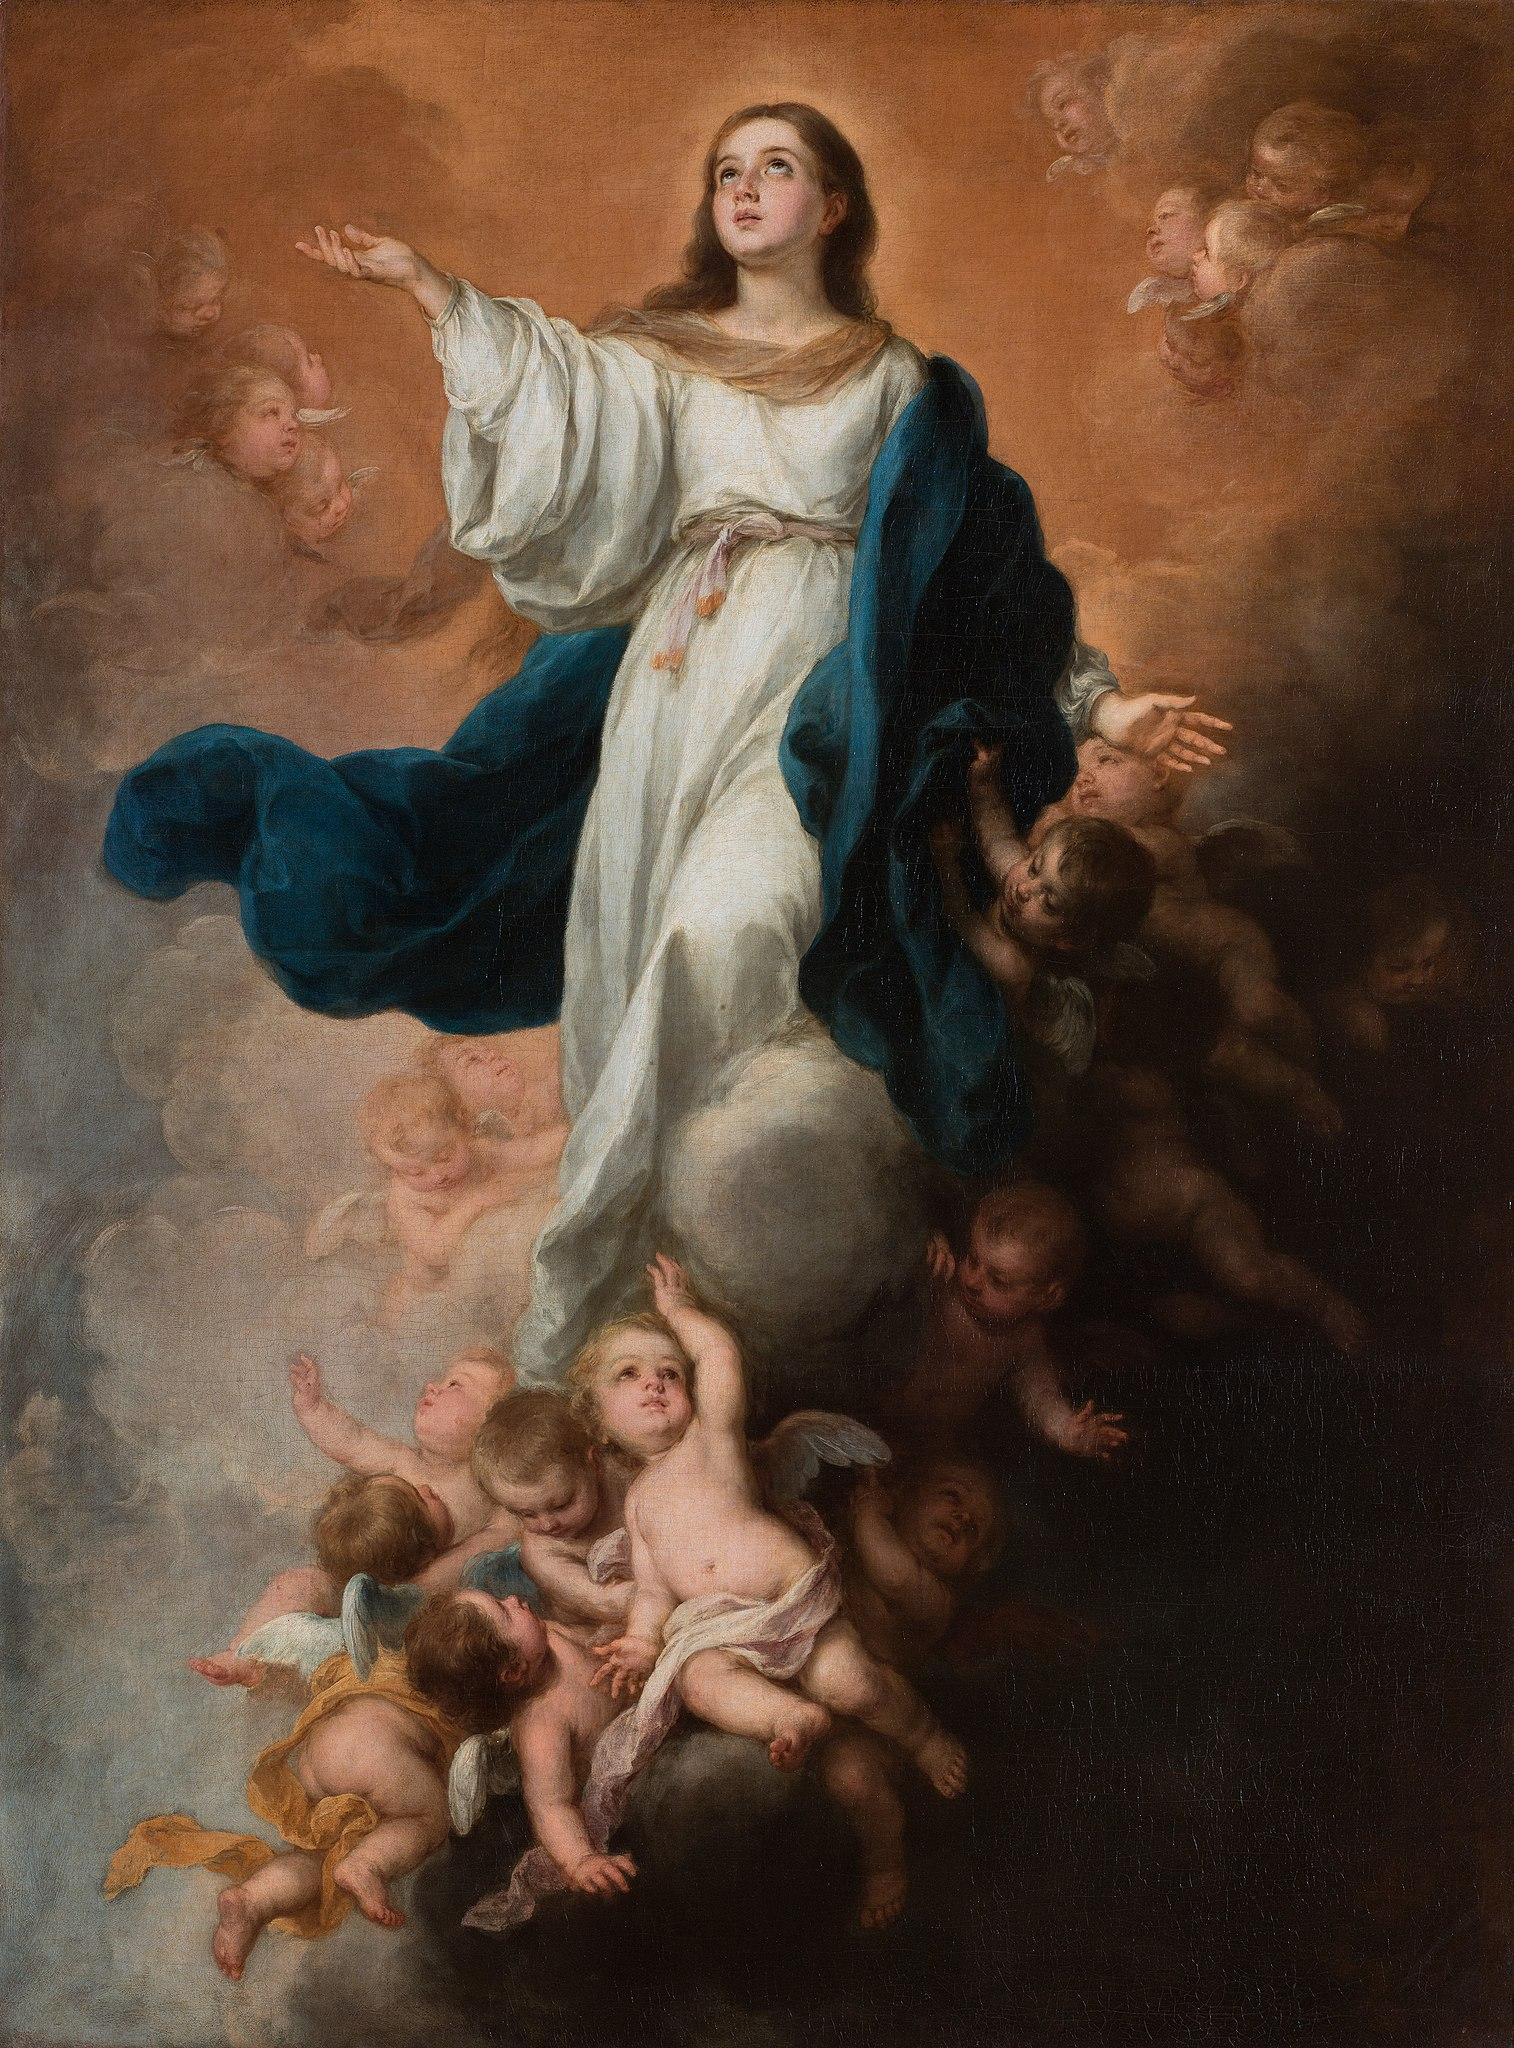 File:Bartolome Murillo - Assumption of the Virgin.jpg - Wikimedia Commons